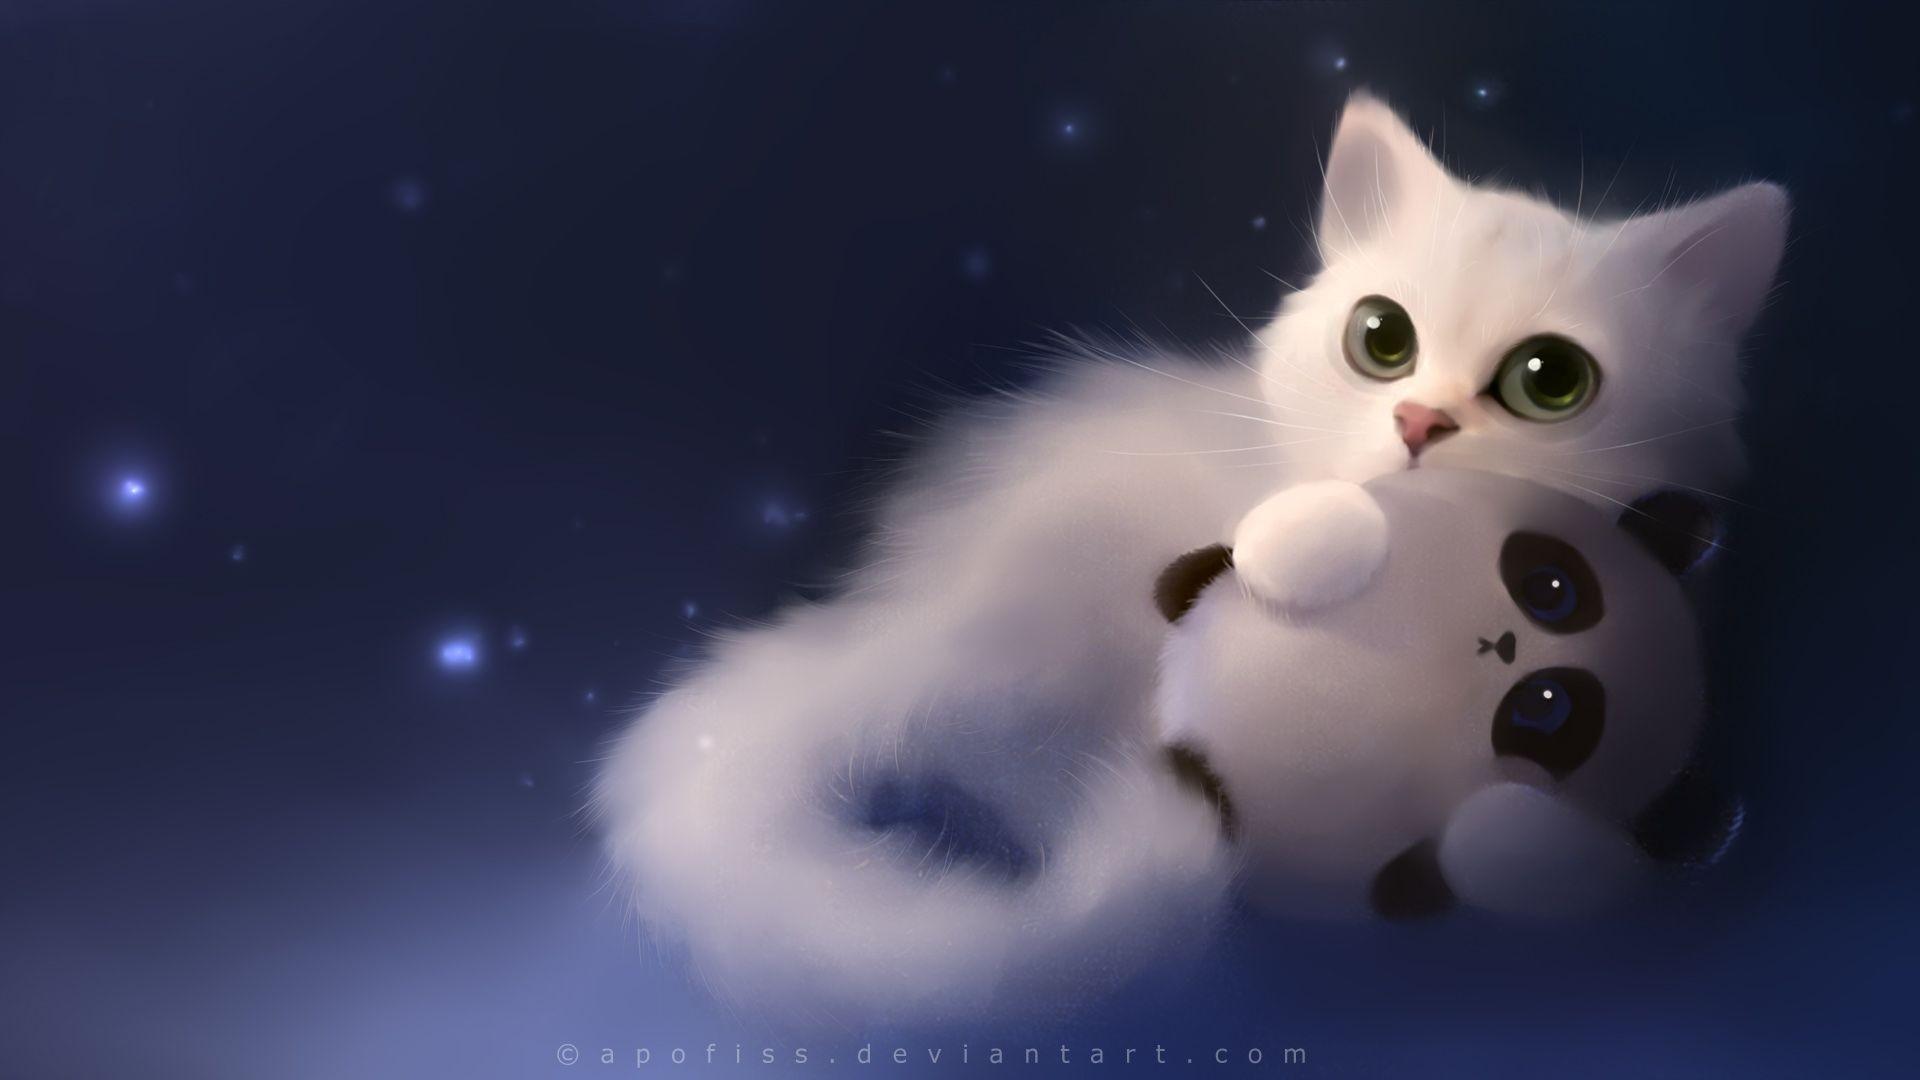 Cute Anime Cat Wallpaper